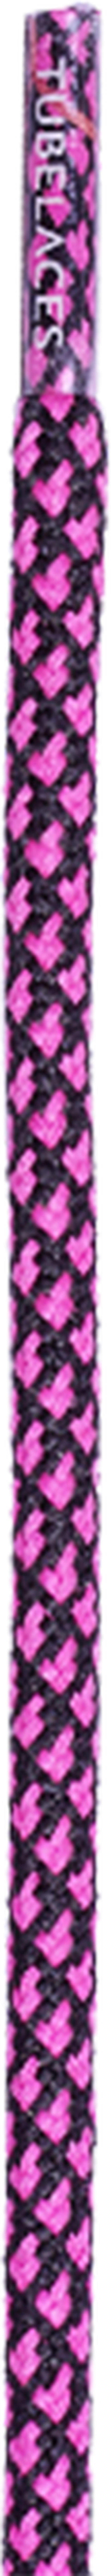 TubeLaces Rope Multi Black/Neon Pink 130 cm 10597